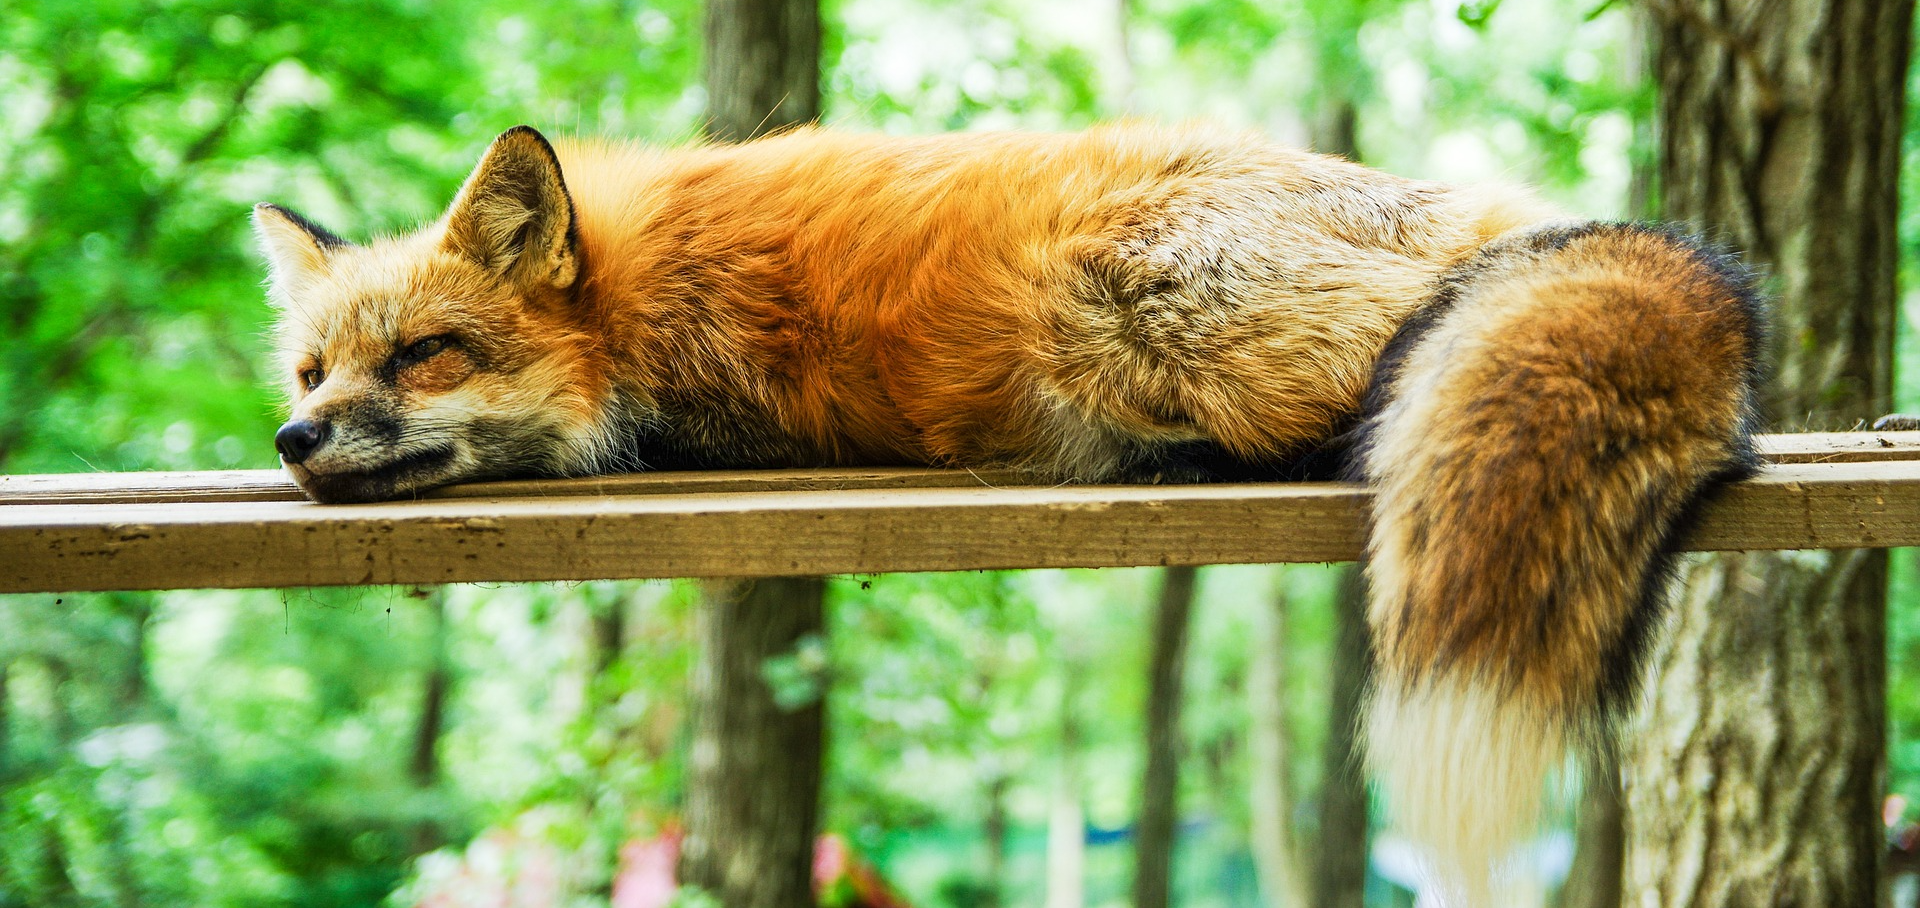 Cute Fox Sleeping